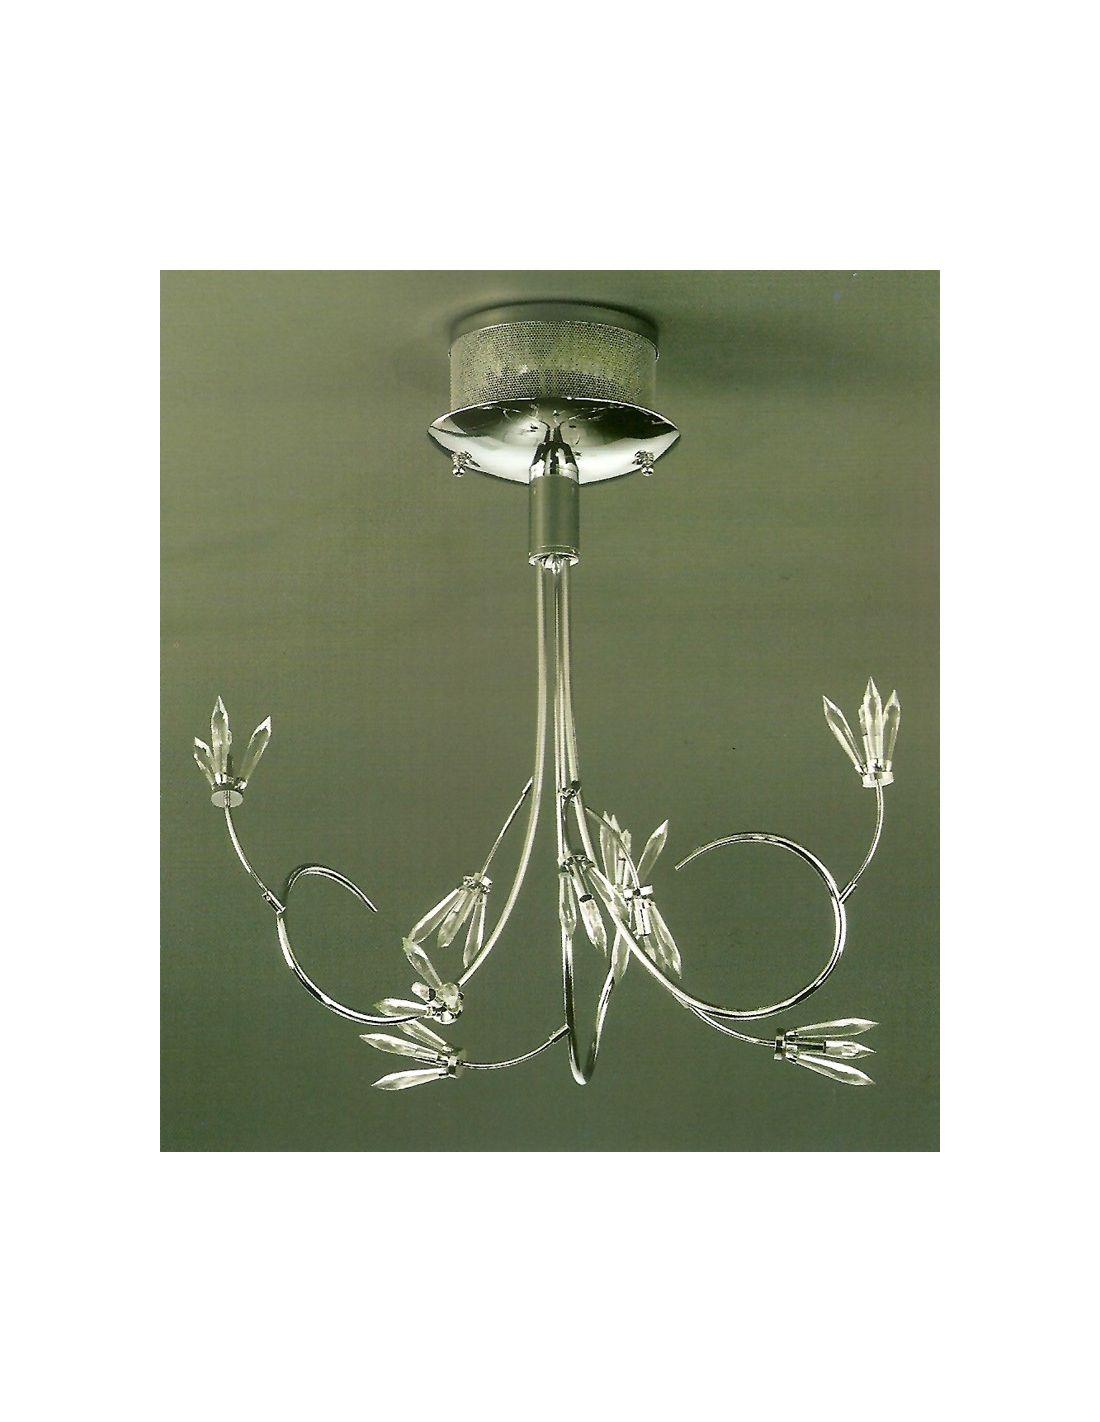 Lamparas lamparas ilumed lamparas online ofertas for Oferta lamparas